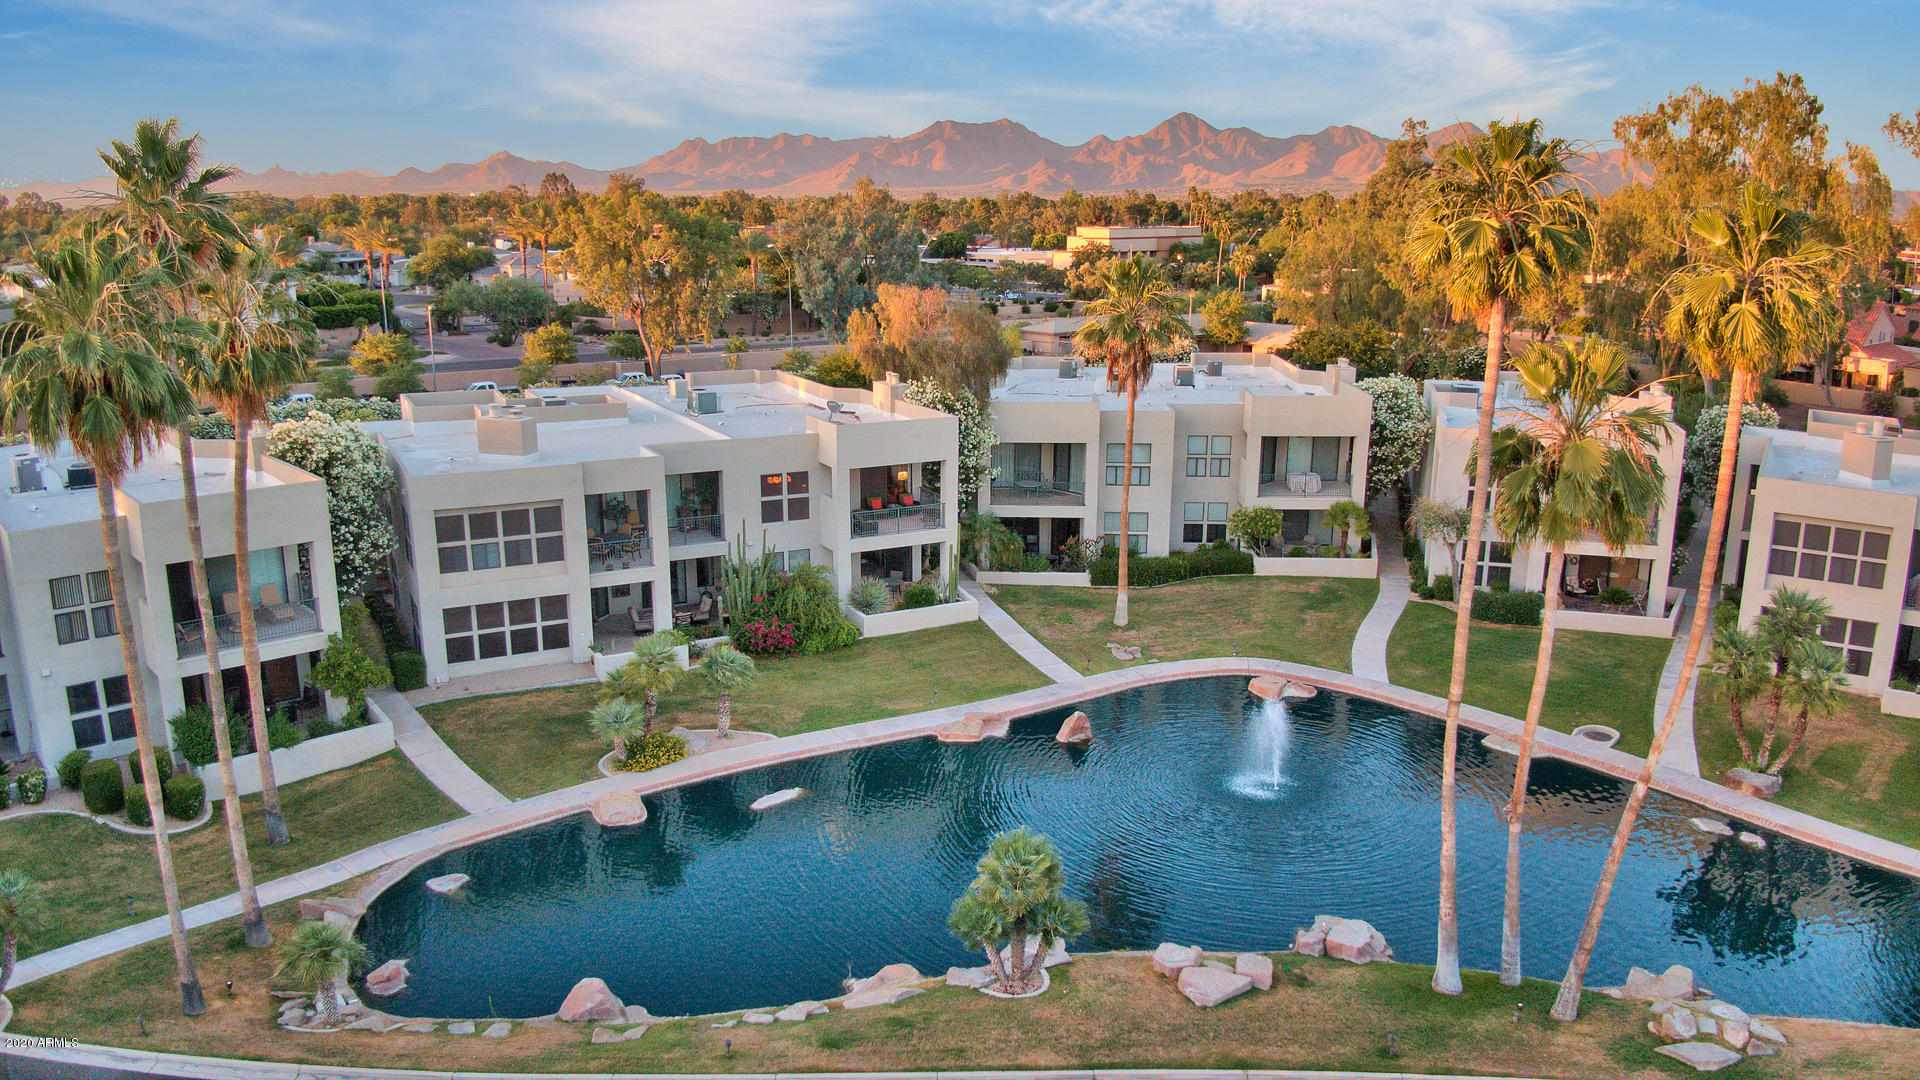 Photo of 7700 E GAINEY RANCH Road #222, Scottsdale, AZ 85258